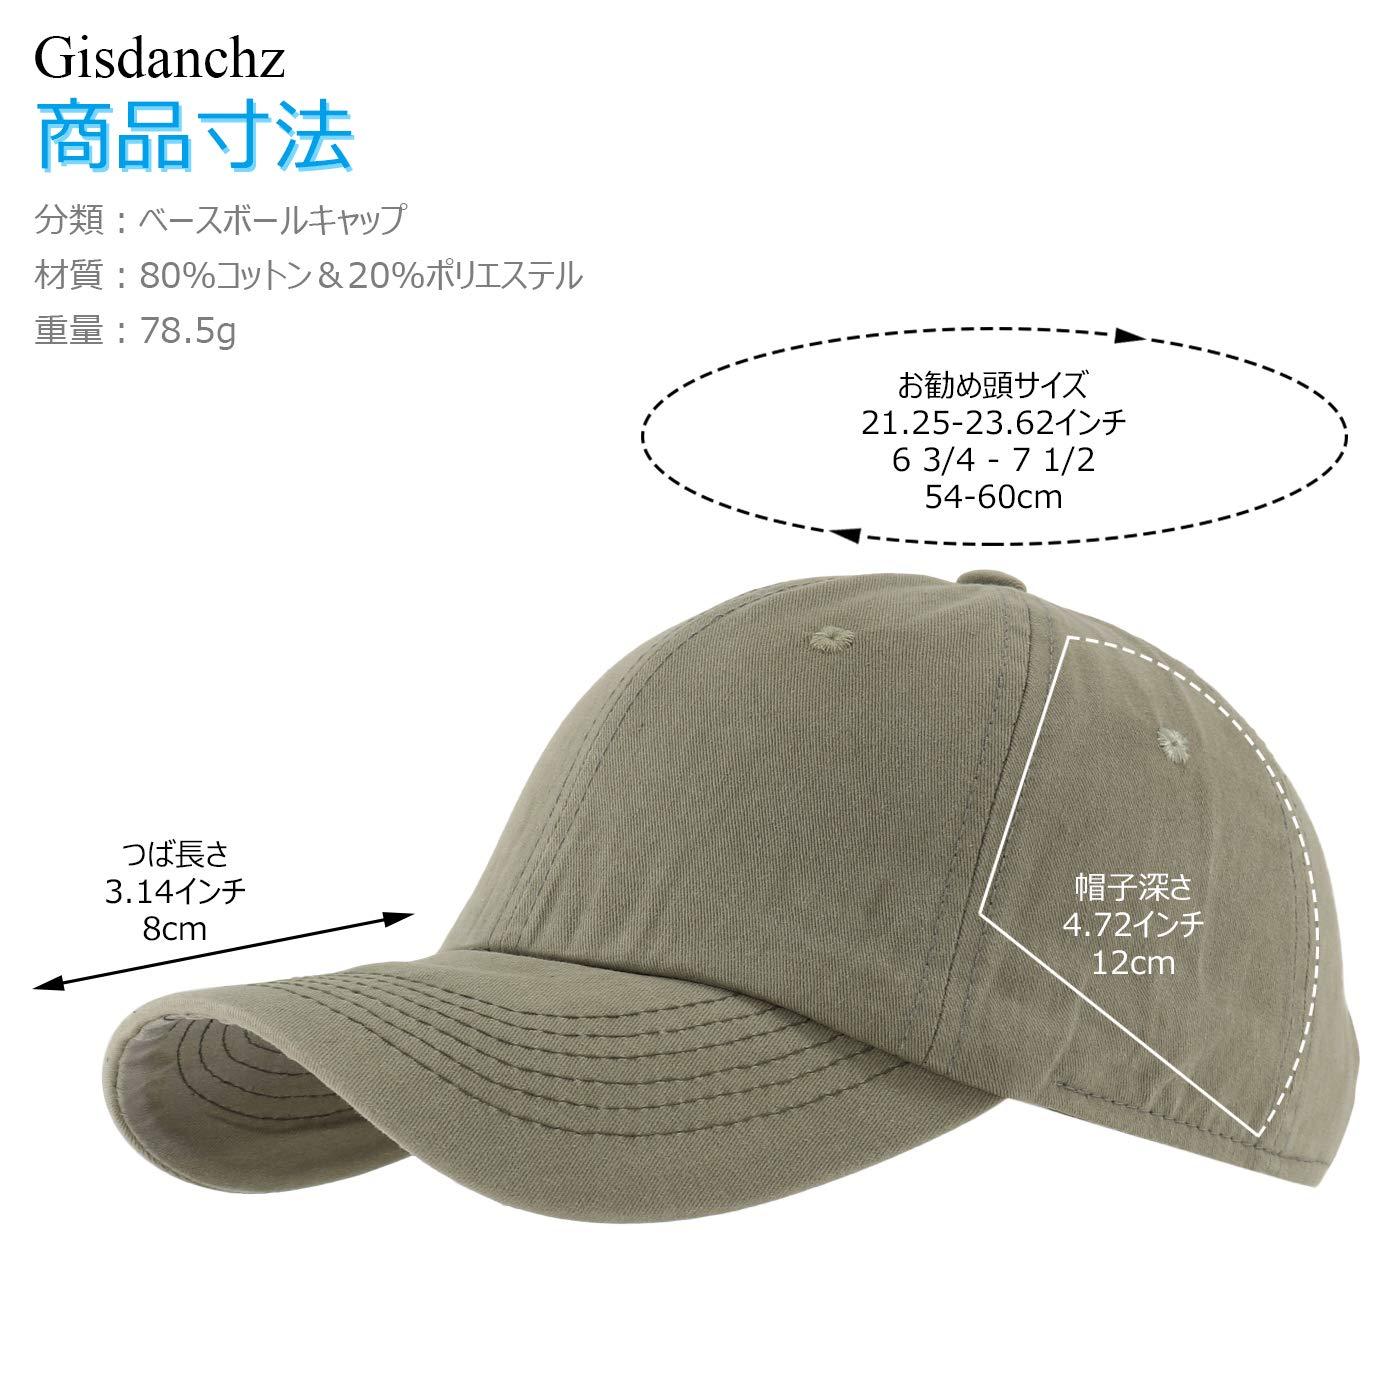 27f9c3f702febf Amazon.co.jp: Gisdanchz 帽子 メンズ キャップ レディース 無地 Cap ベースボールキャップ Hat 夏 Uvカット 帽子  野球帽 ベースボールキャップ ベースボールキャップ ...